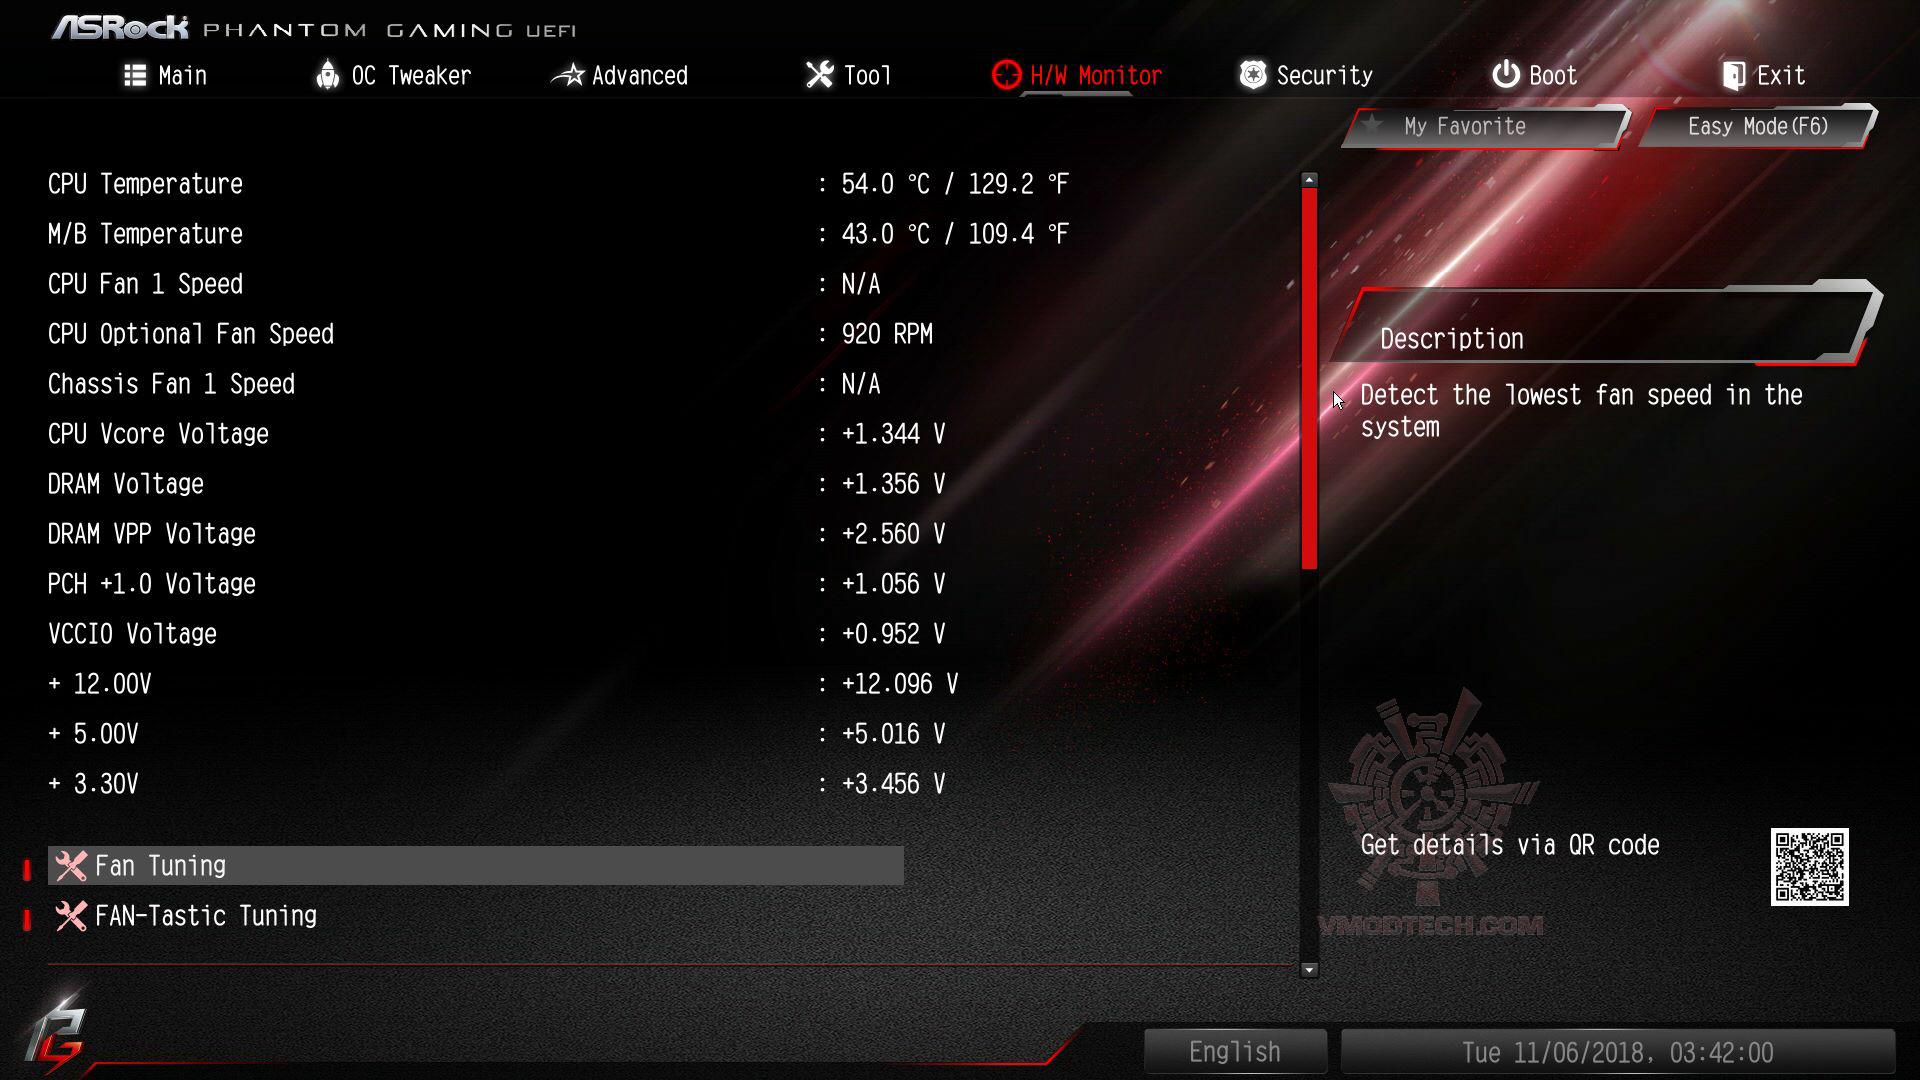 45780298 311301849701935 4149654121286205440 n ASRock Z390 Phantom Gaming ITX/ac Review